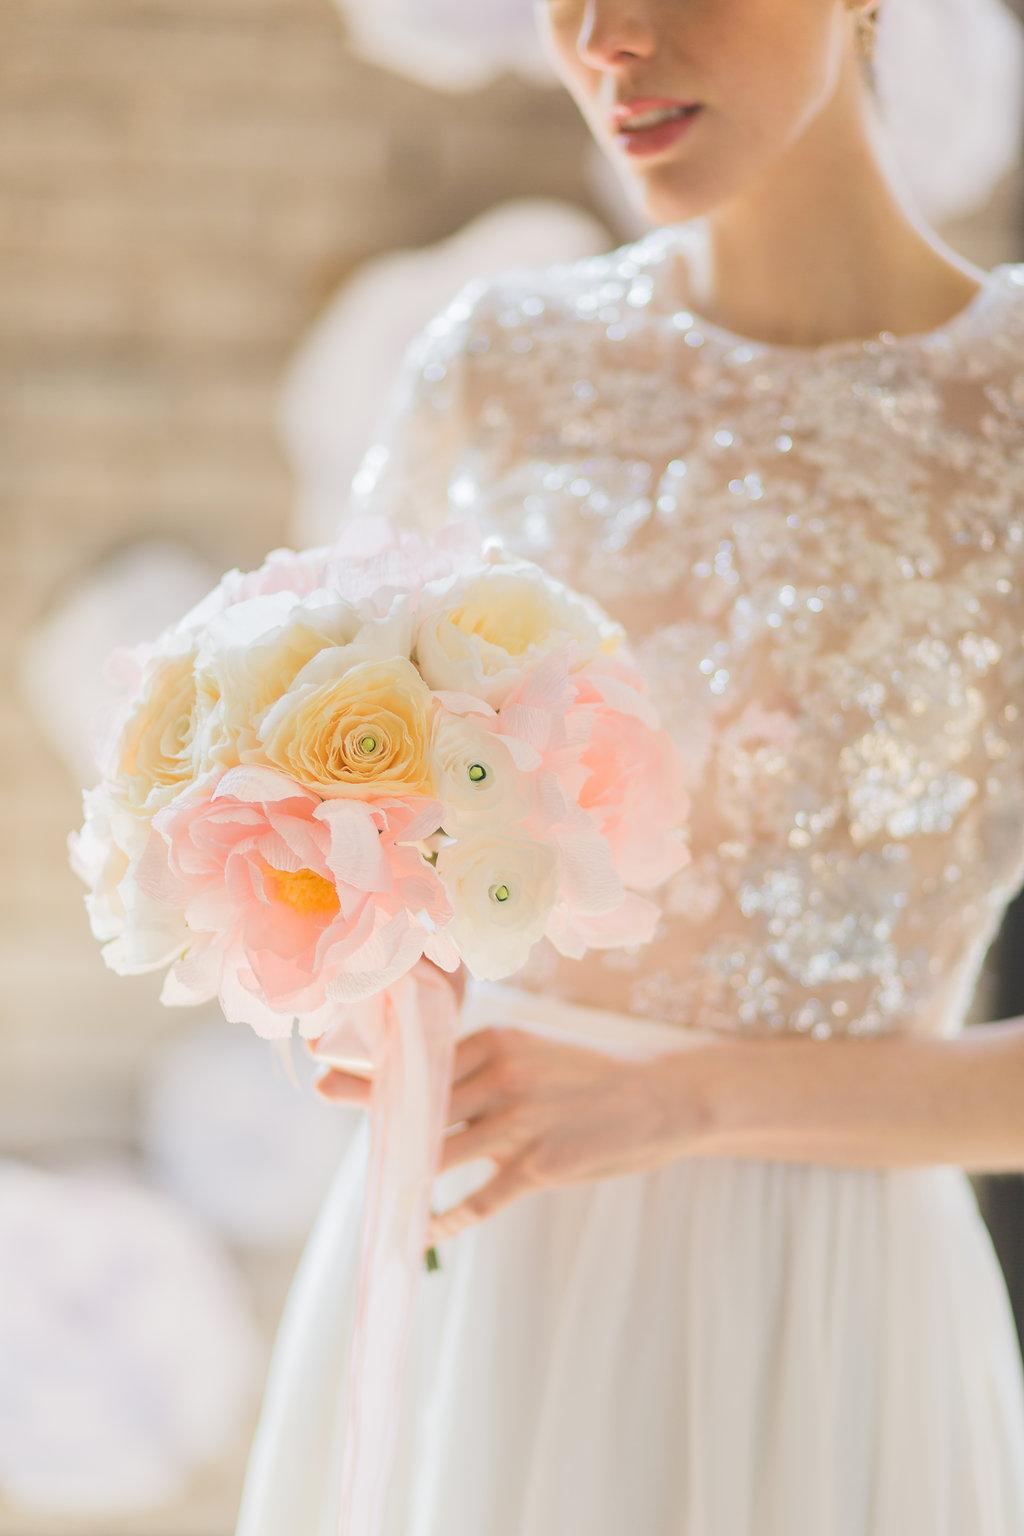 Phoebe Lo Events Toronto Wedding - Storys Building Urban Loft Paper Inspired Wedding 028.jpg